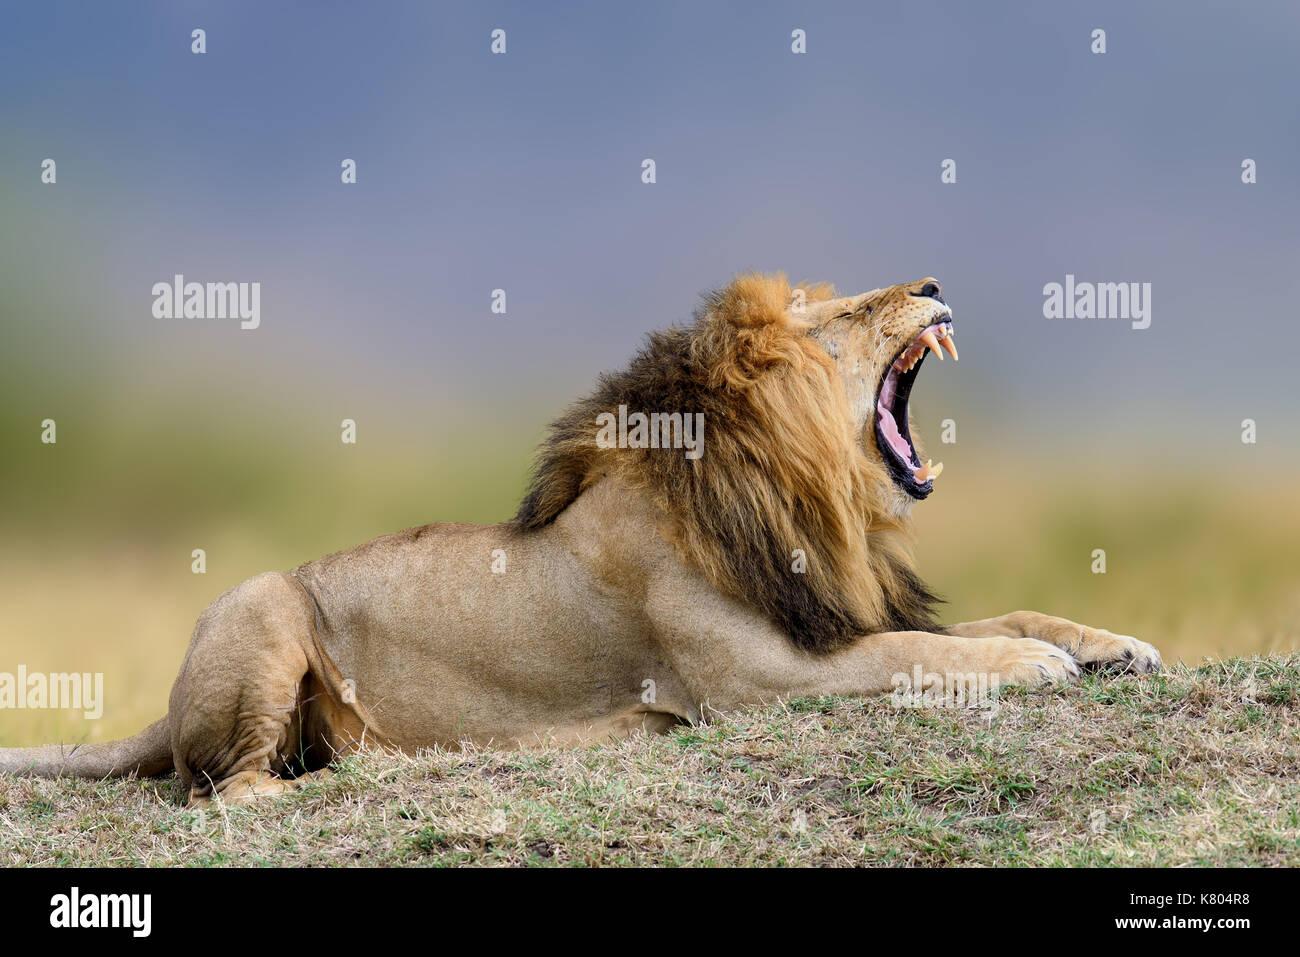 African lions, Panthera leo, Masai Mara National Park, Kenya, Africa. Cat in nature habitat. Greeting of cats - Stock Image